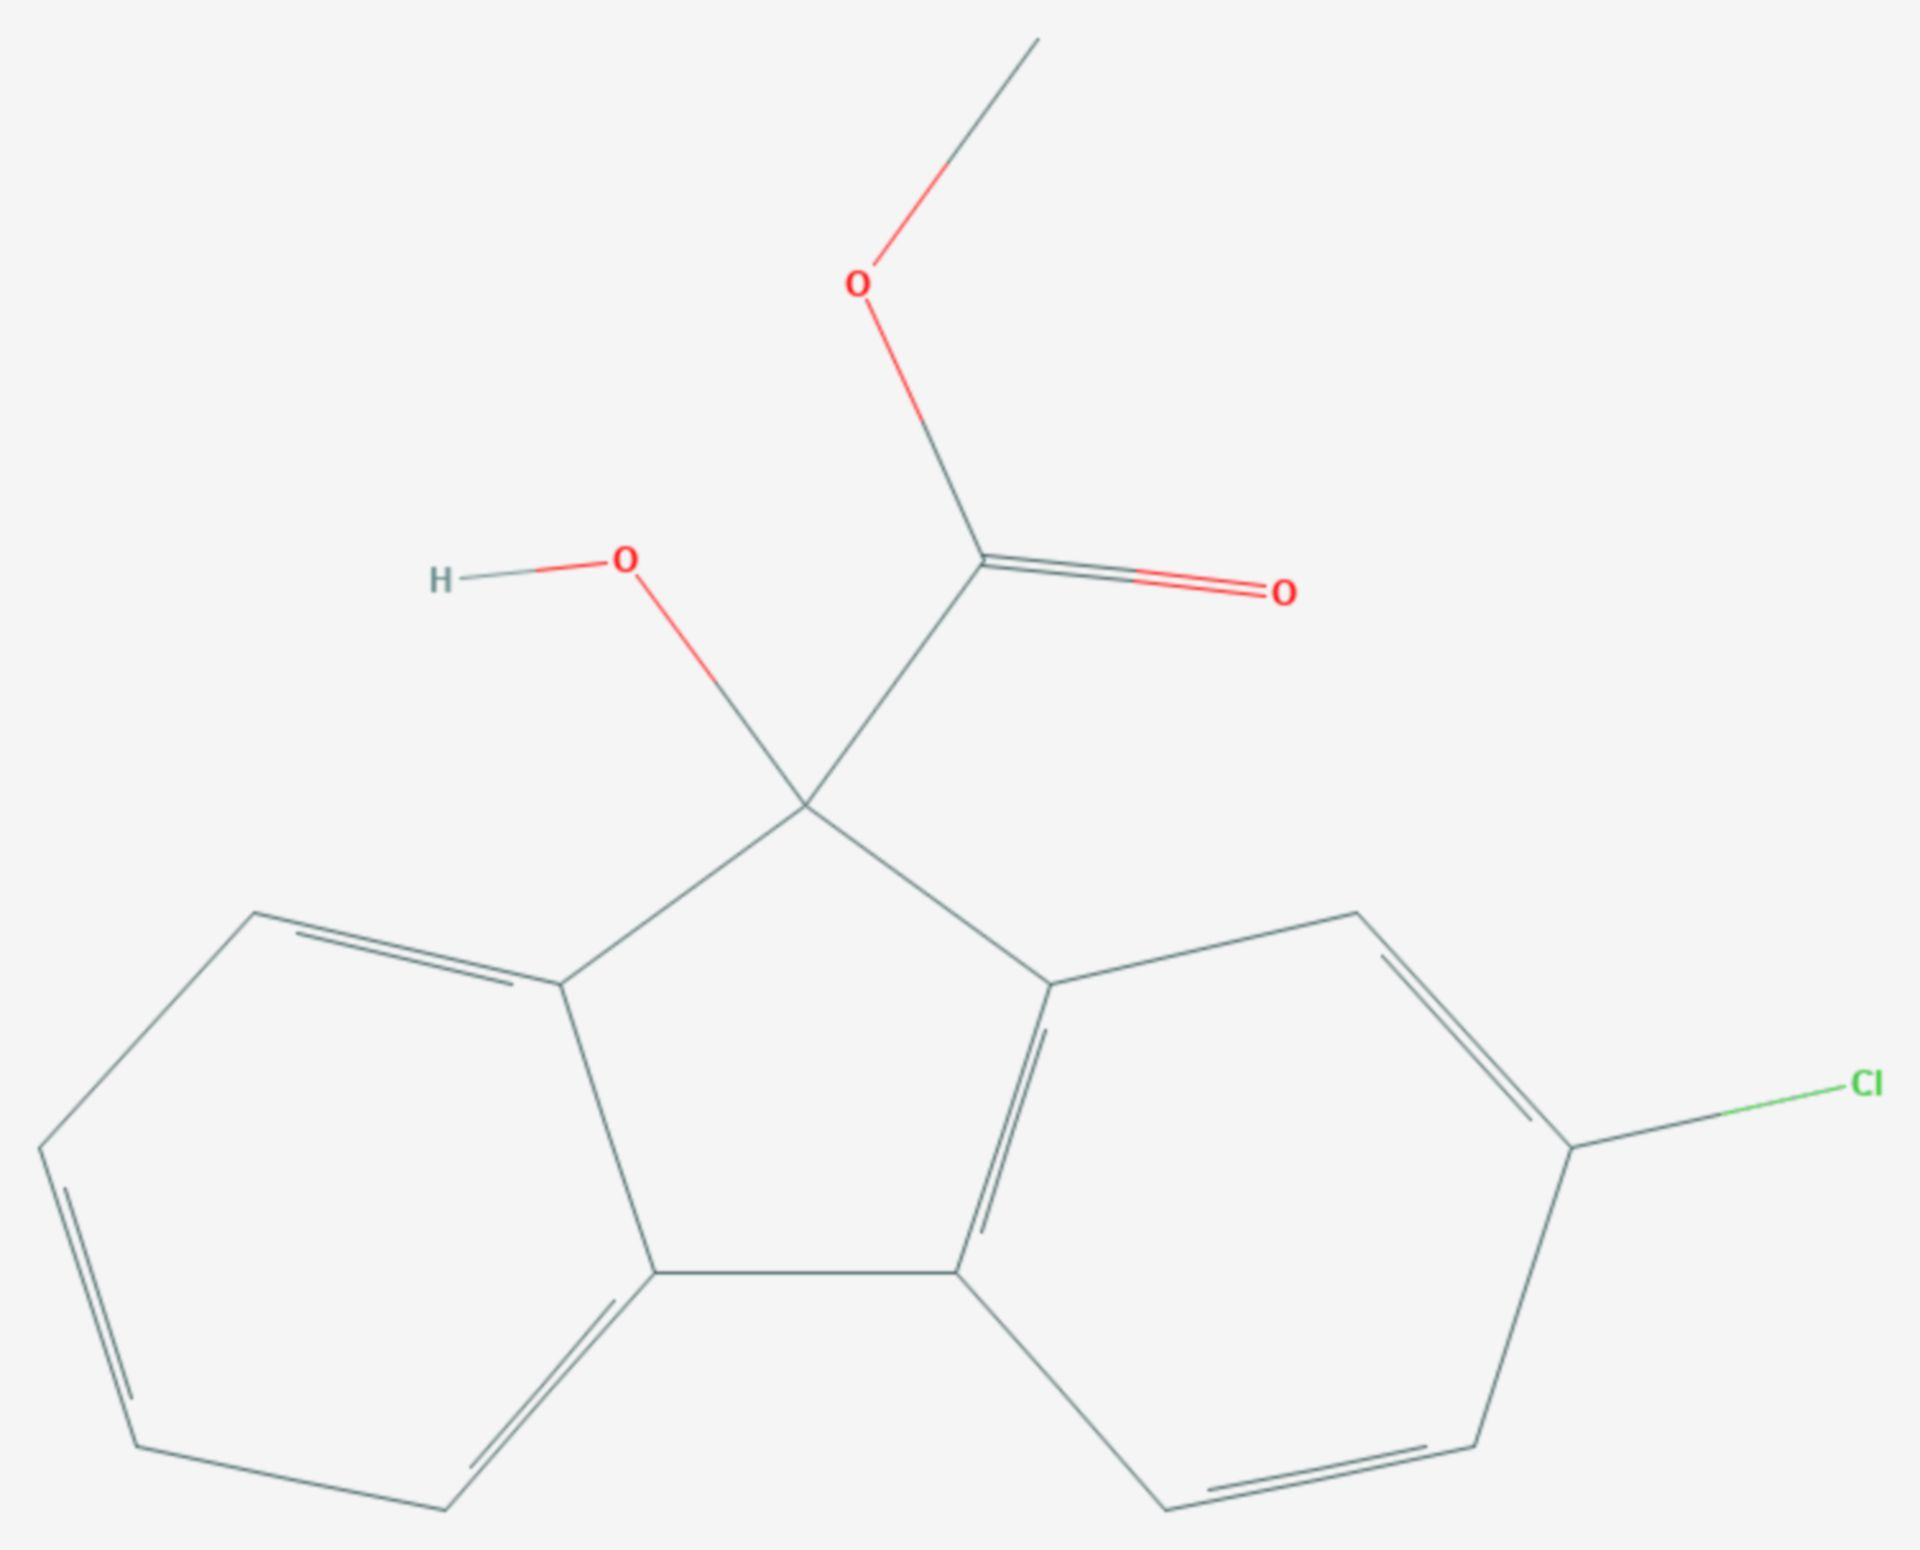 Chlorflurenol (Strukturformel)